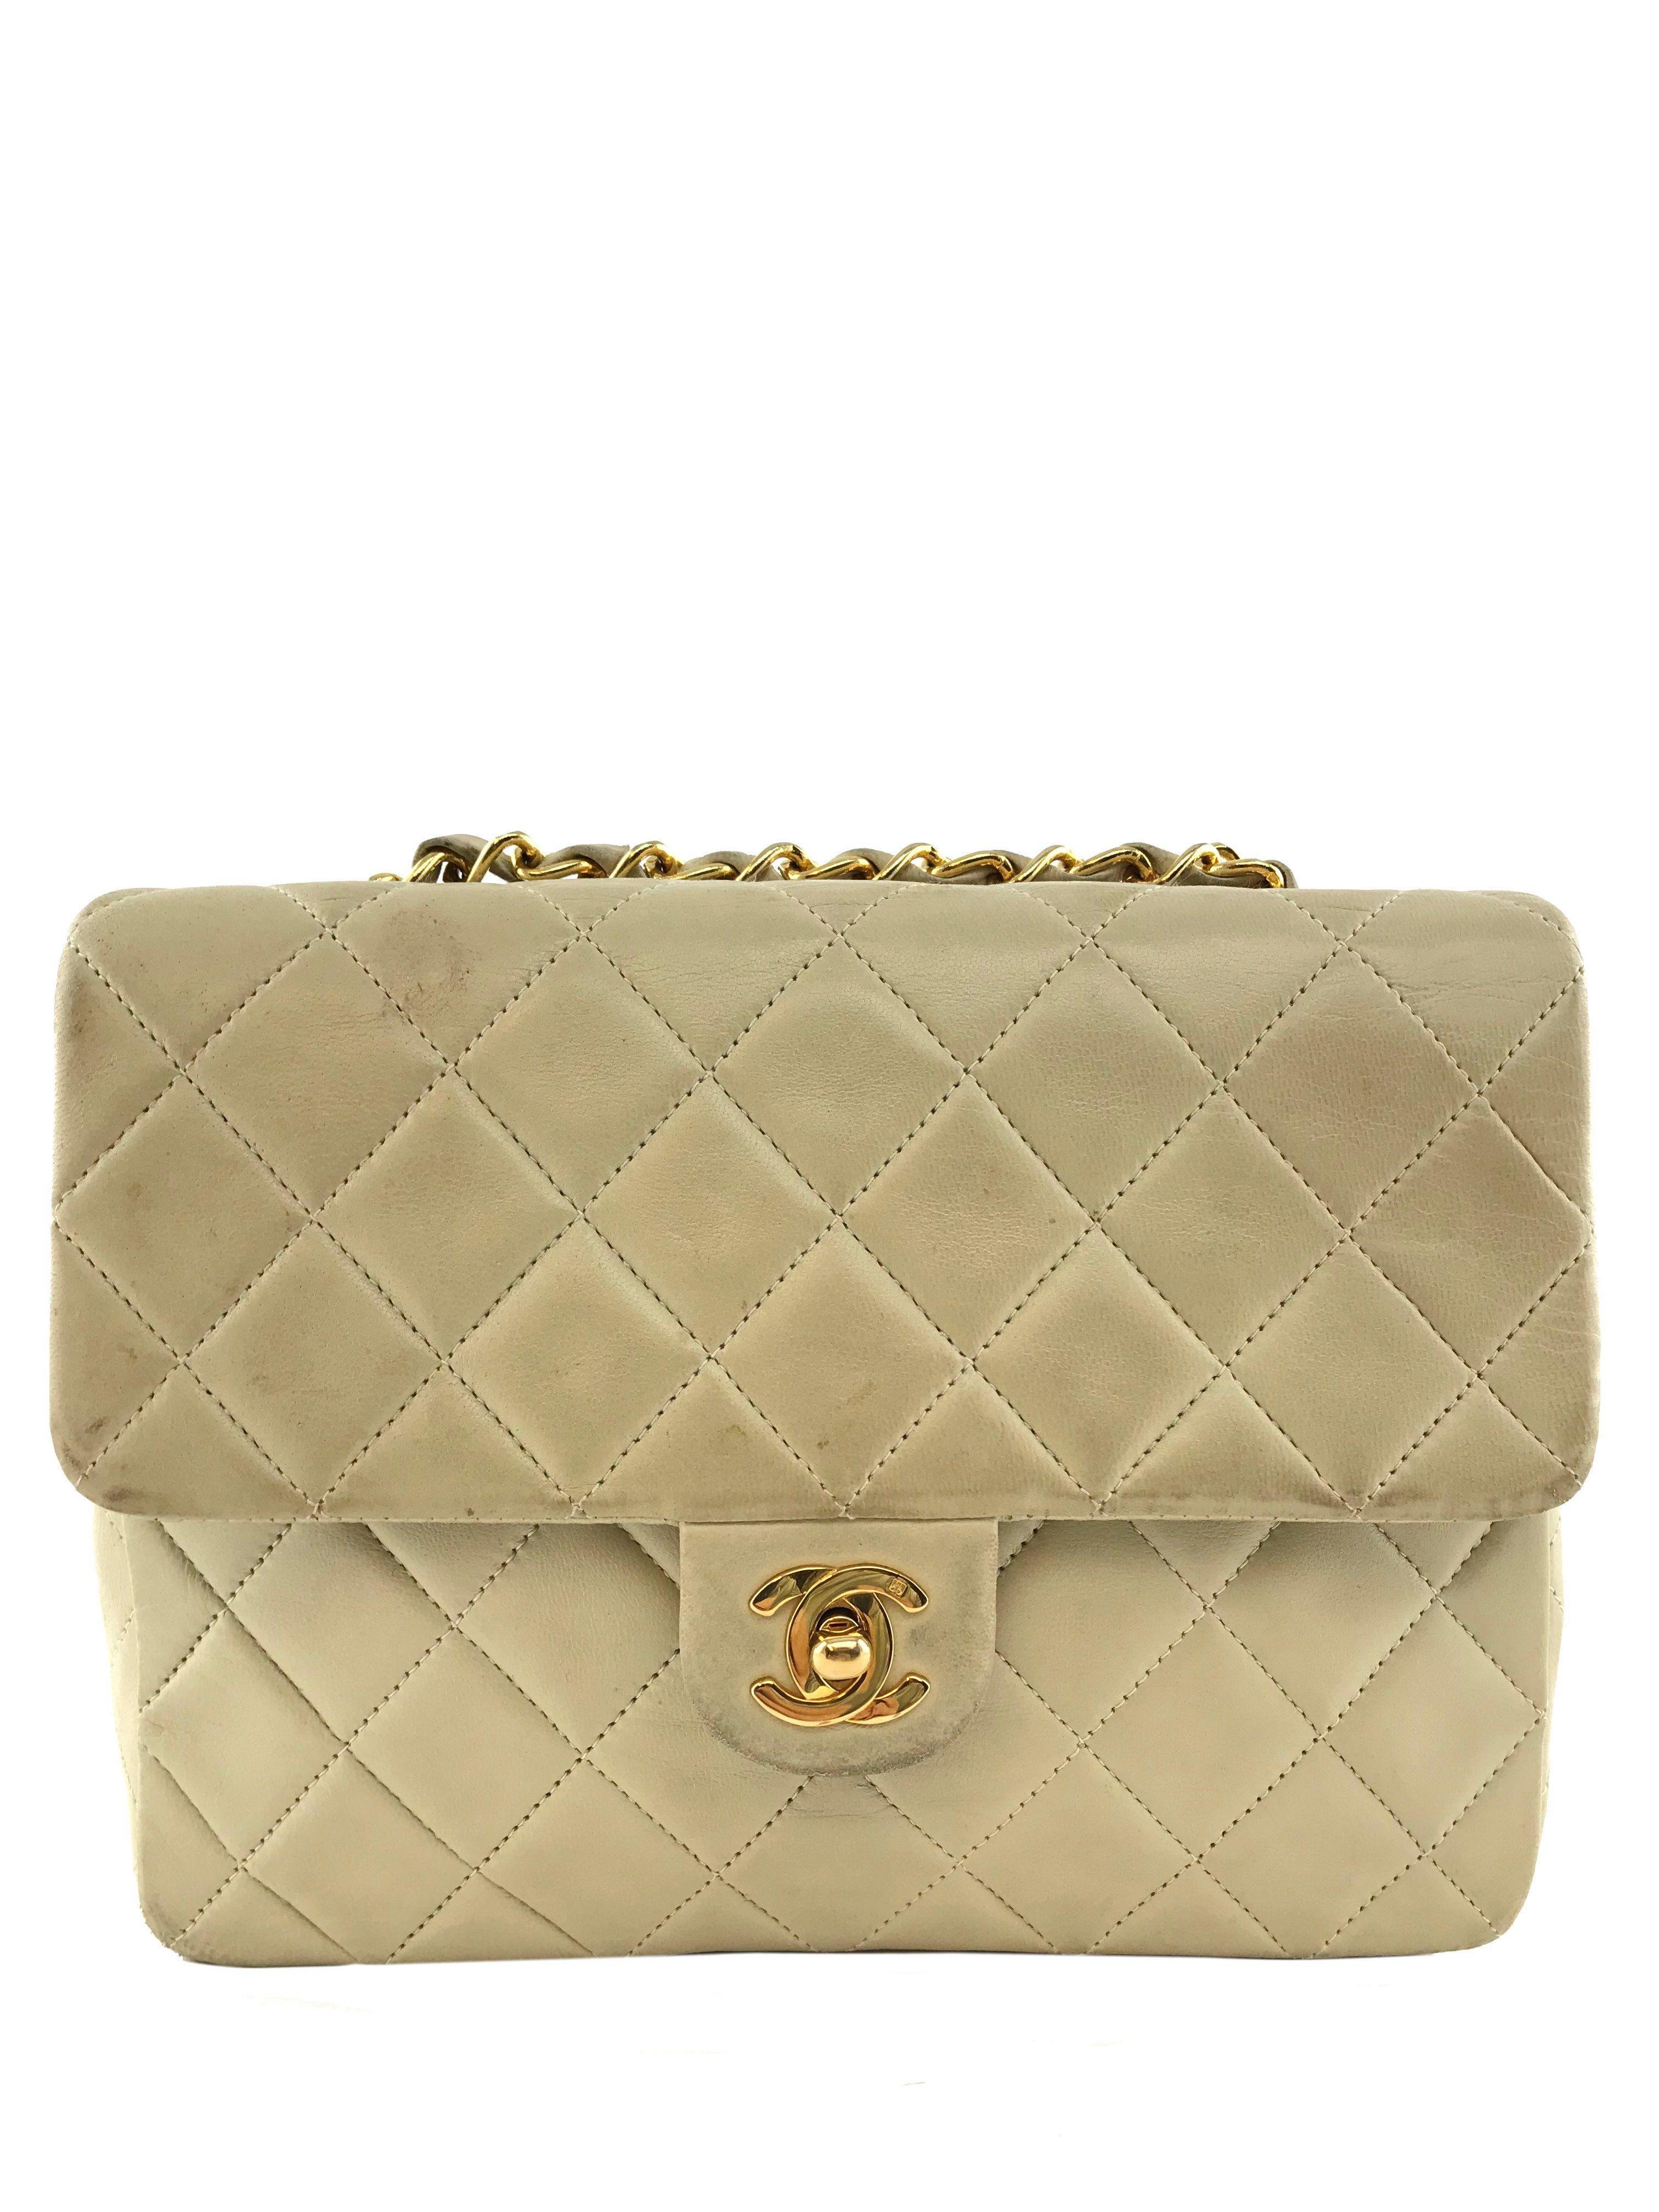 e10581ad8fc3e0 Chanel Vintage Lambskin Quilted Small Single Flap Vintage Chanel, Classic, Shoulder  Bag, Shoulder